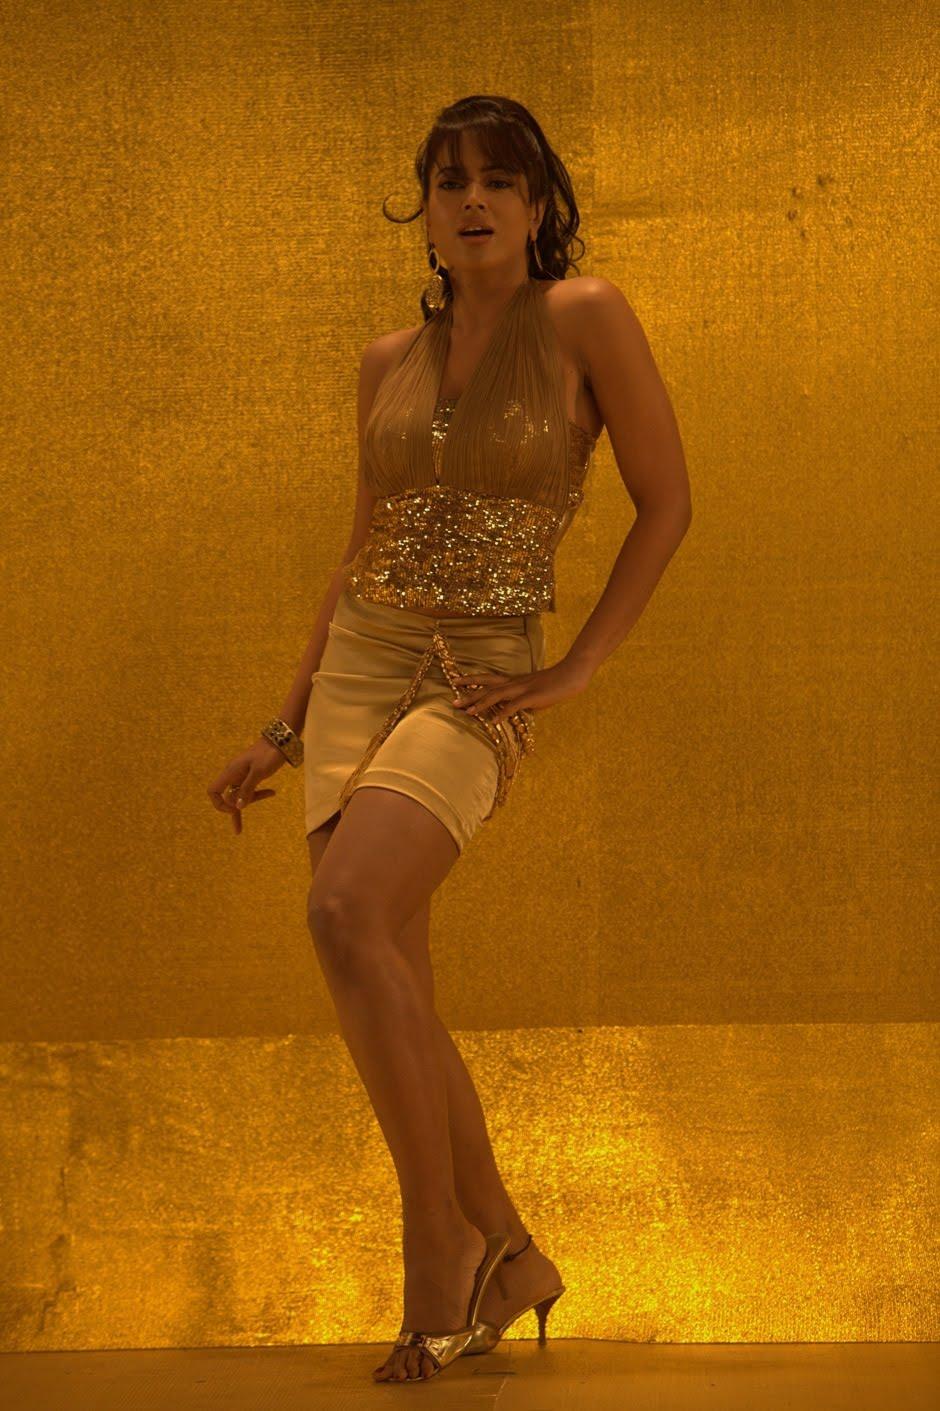 Hot Sexy Sameera Reddy Photos Latest Stills - Actress Shots-6851